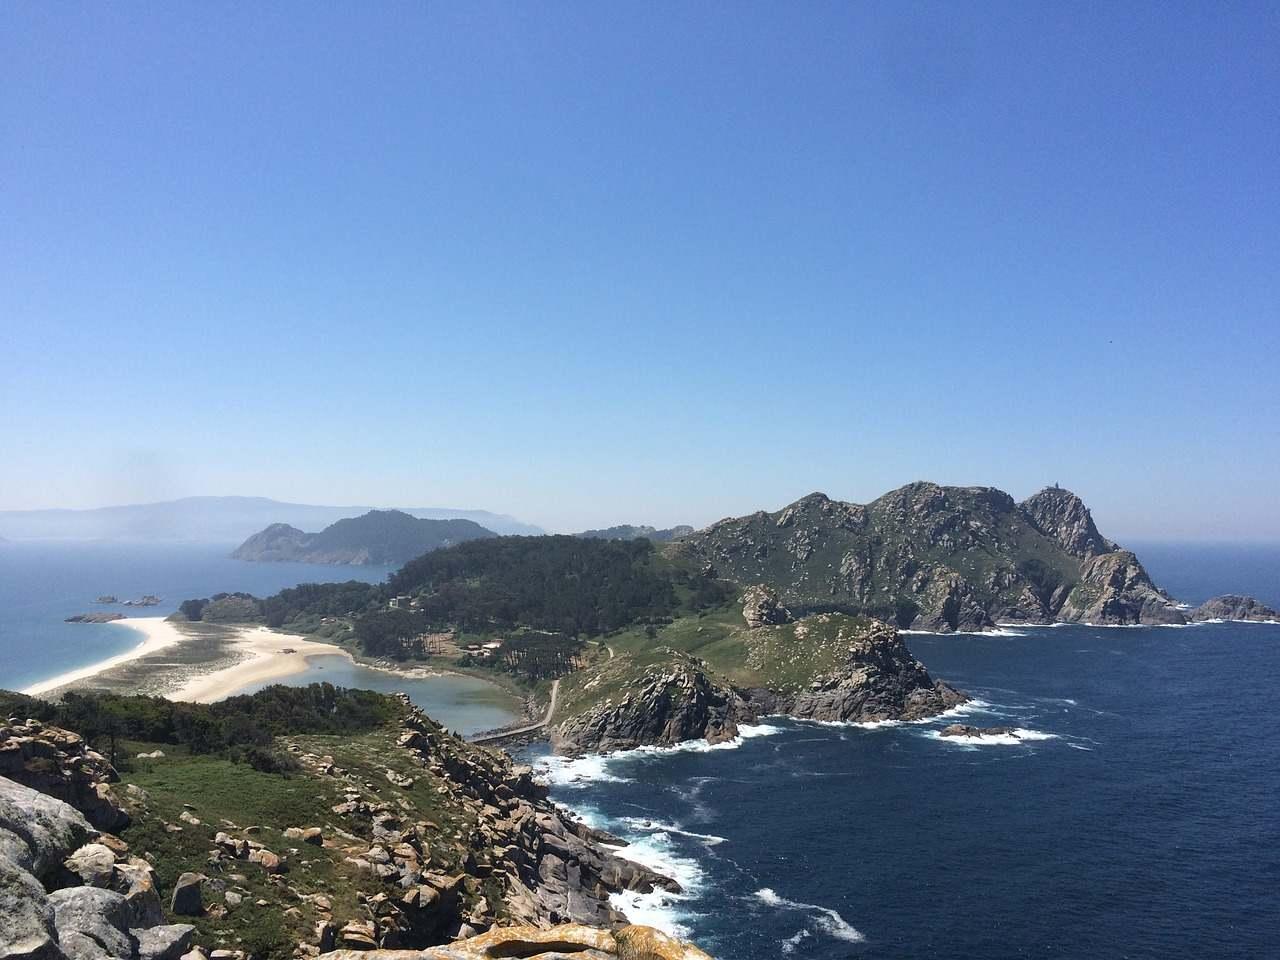 Cies Islands, Best Beaches in Spain